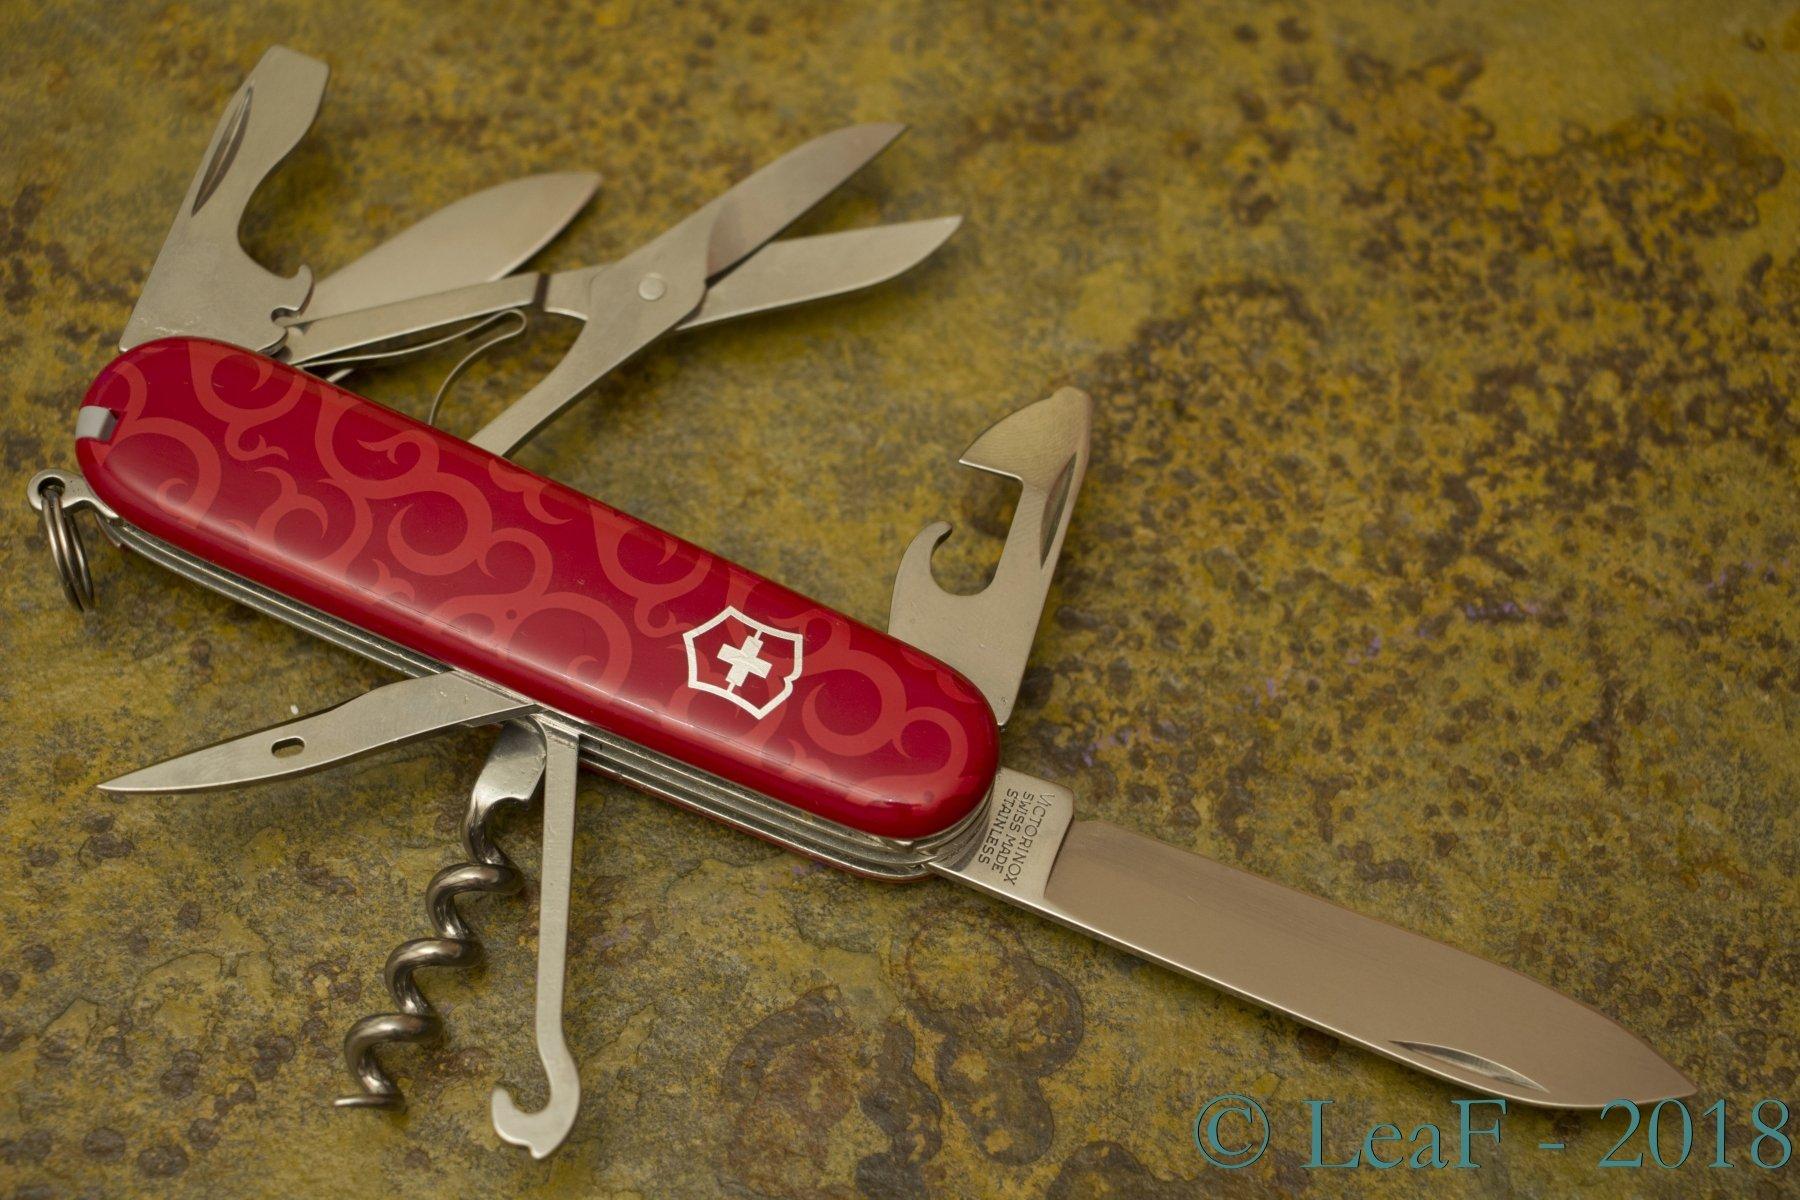 230 Climber Rei Tribal Leaf S Victorinox Knives